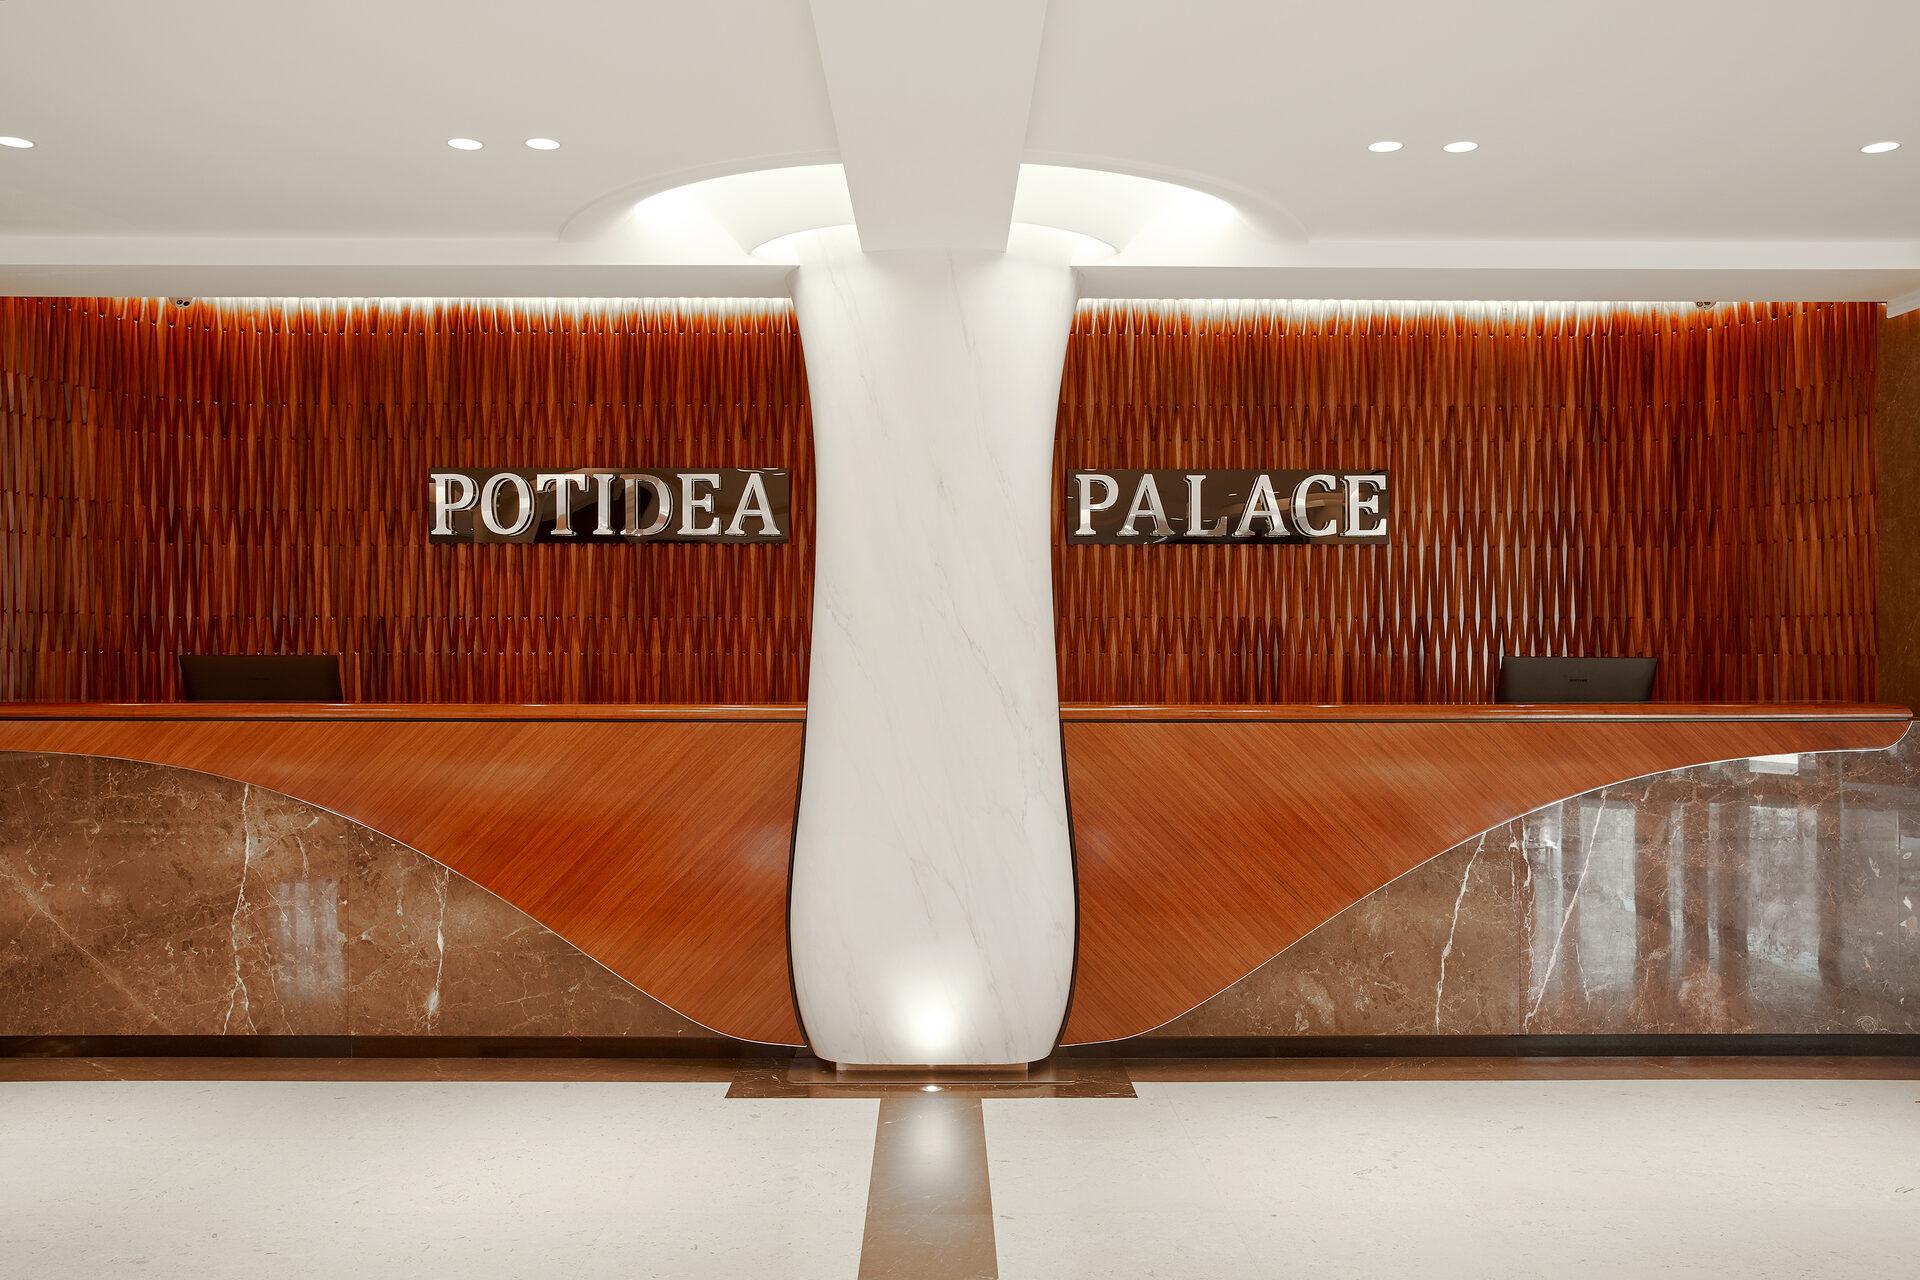 Potidea Palace